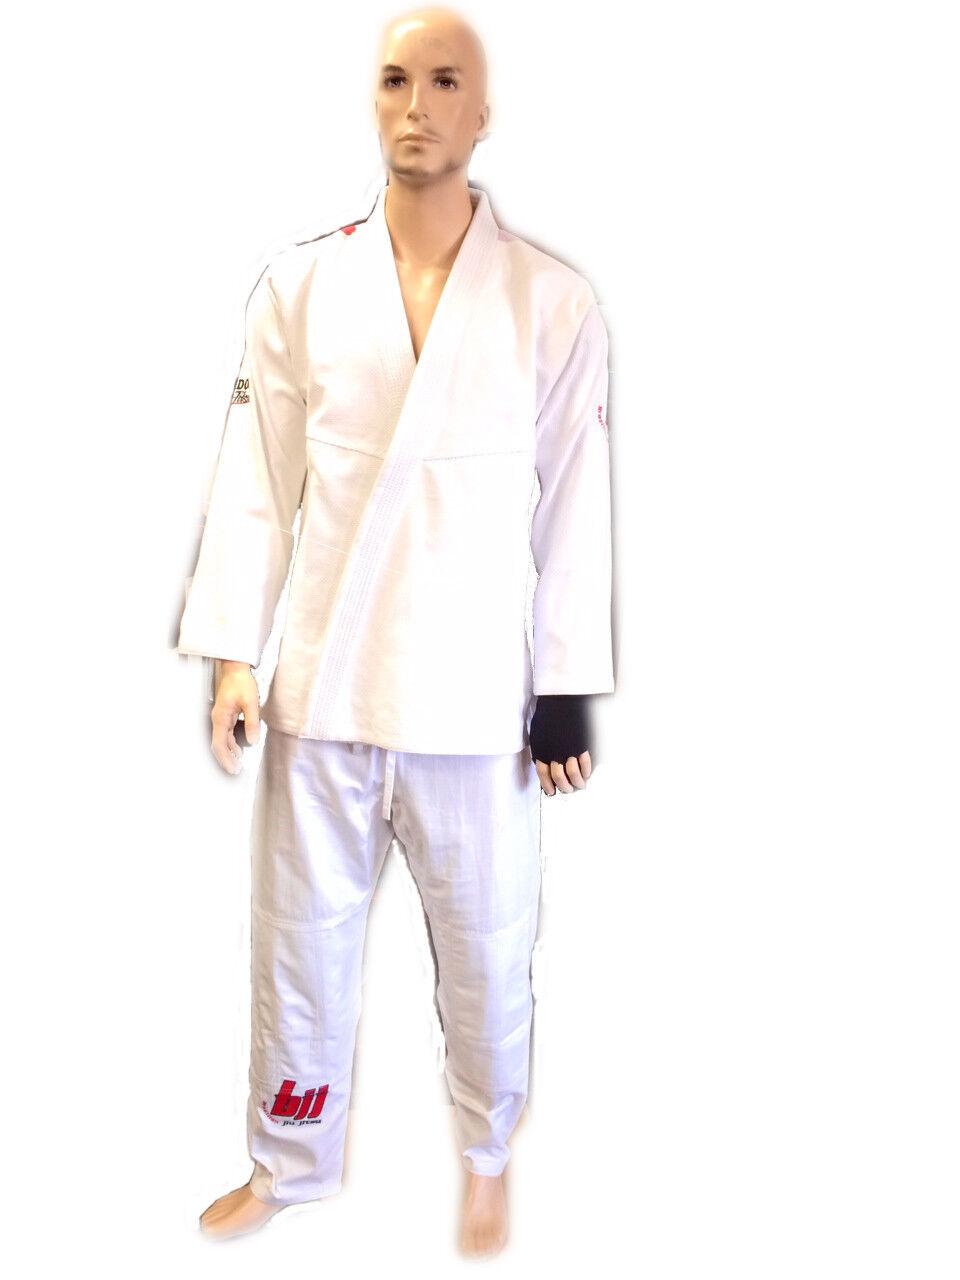 Woldorf usa BJJ jiu jitsu uniform gi student  in white color flags on shoulders  guaranteed